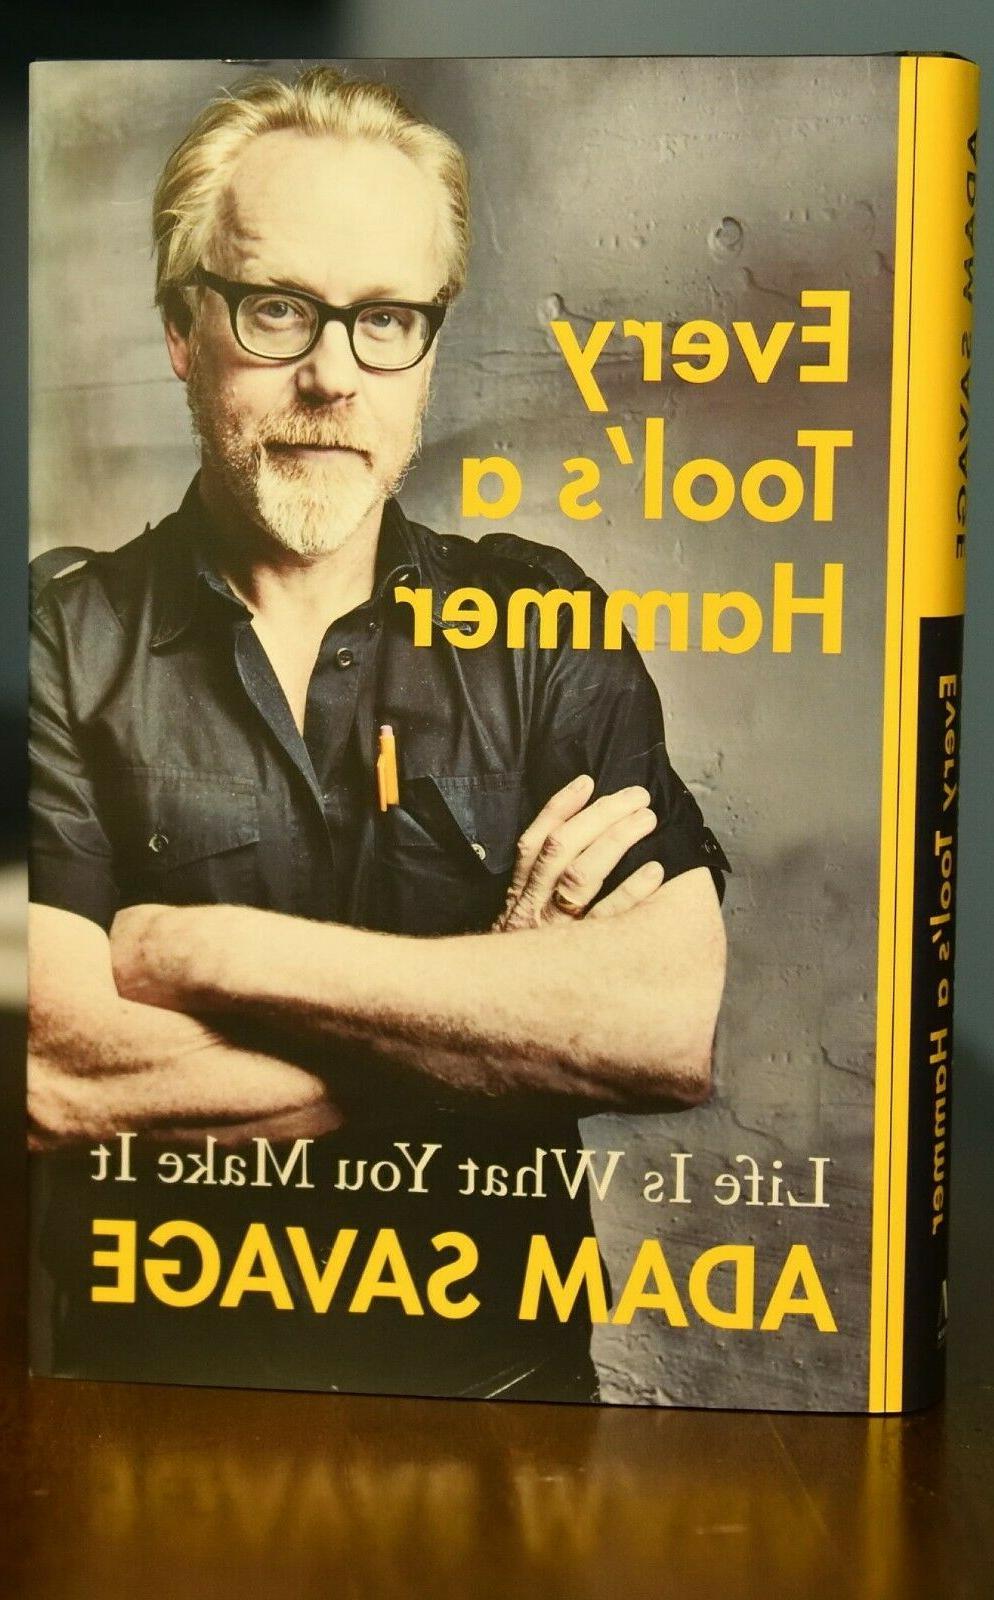 new adam savage book signed every tool